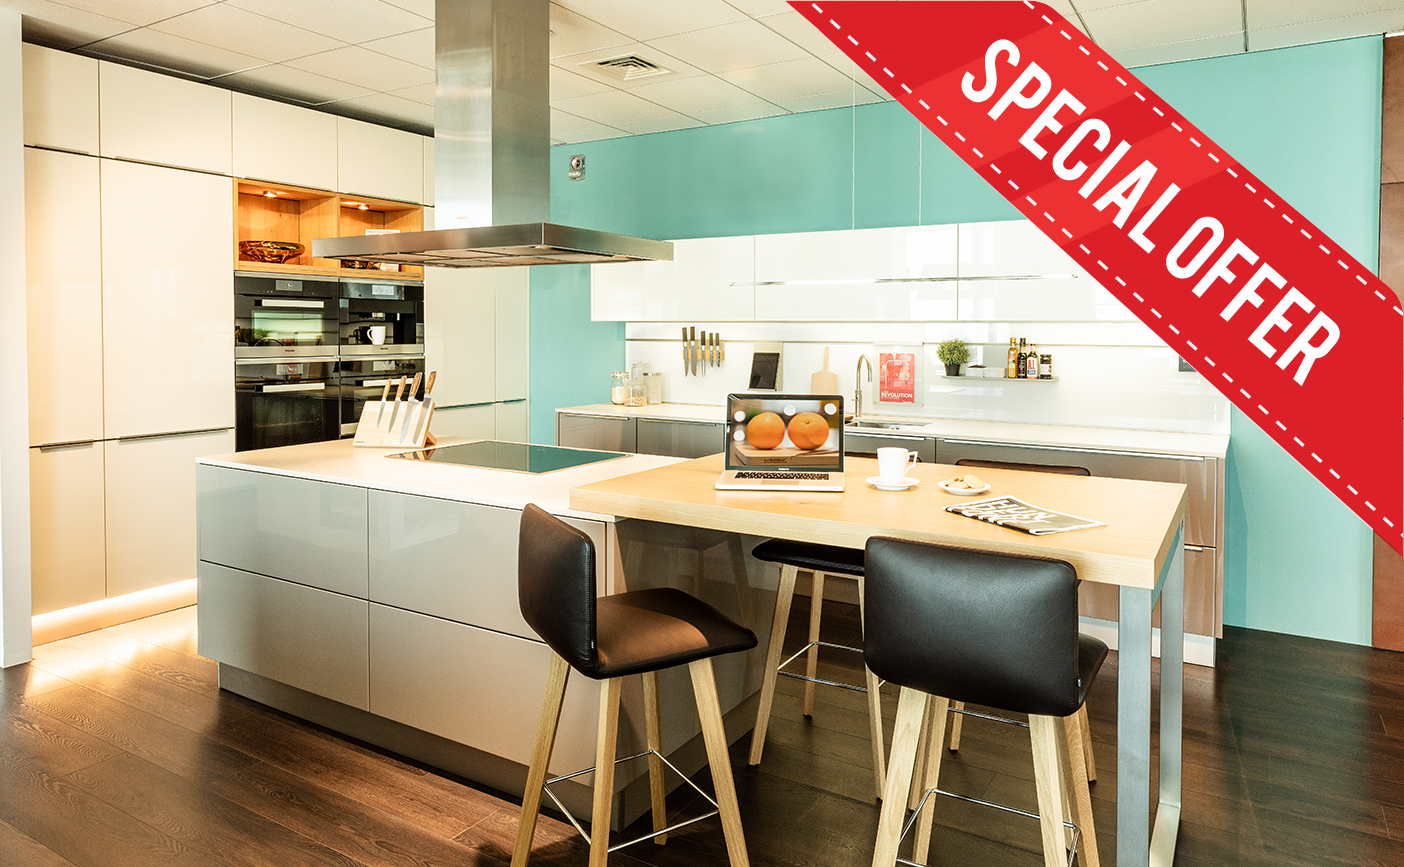 Luxury German Kitchen Design Company in Dubai | GOETTLING